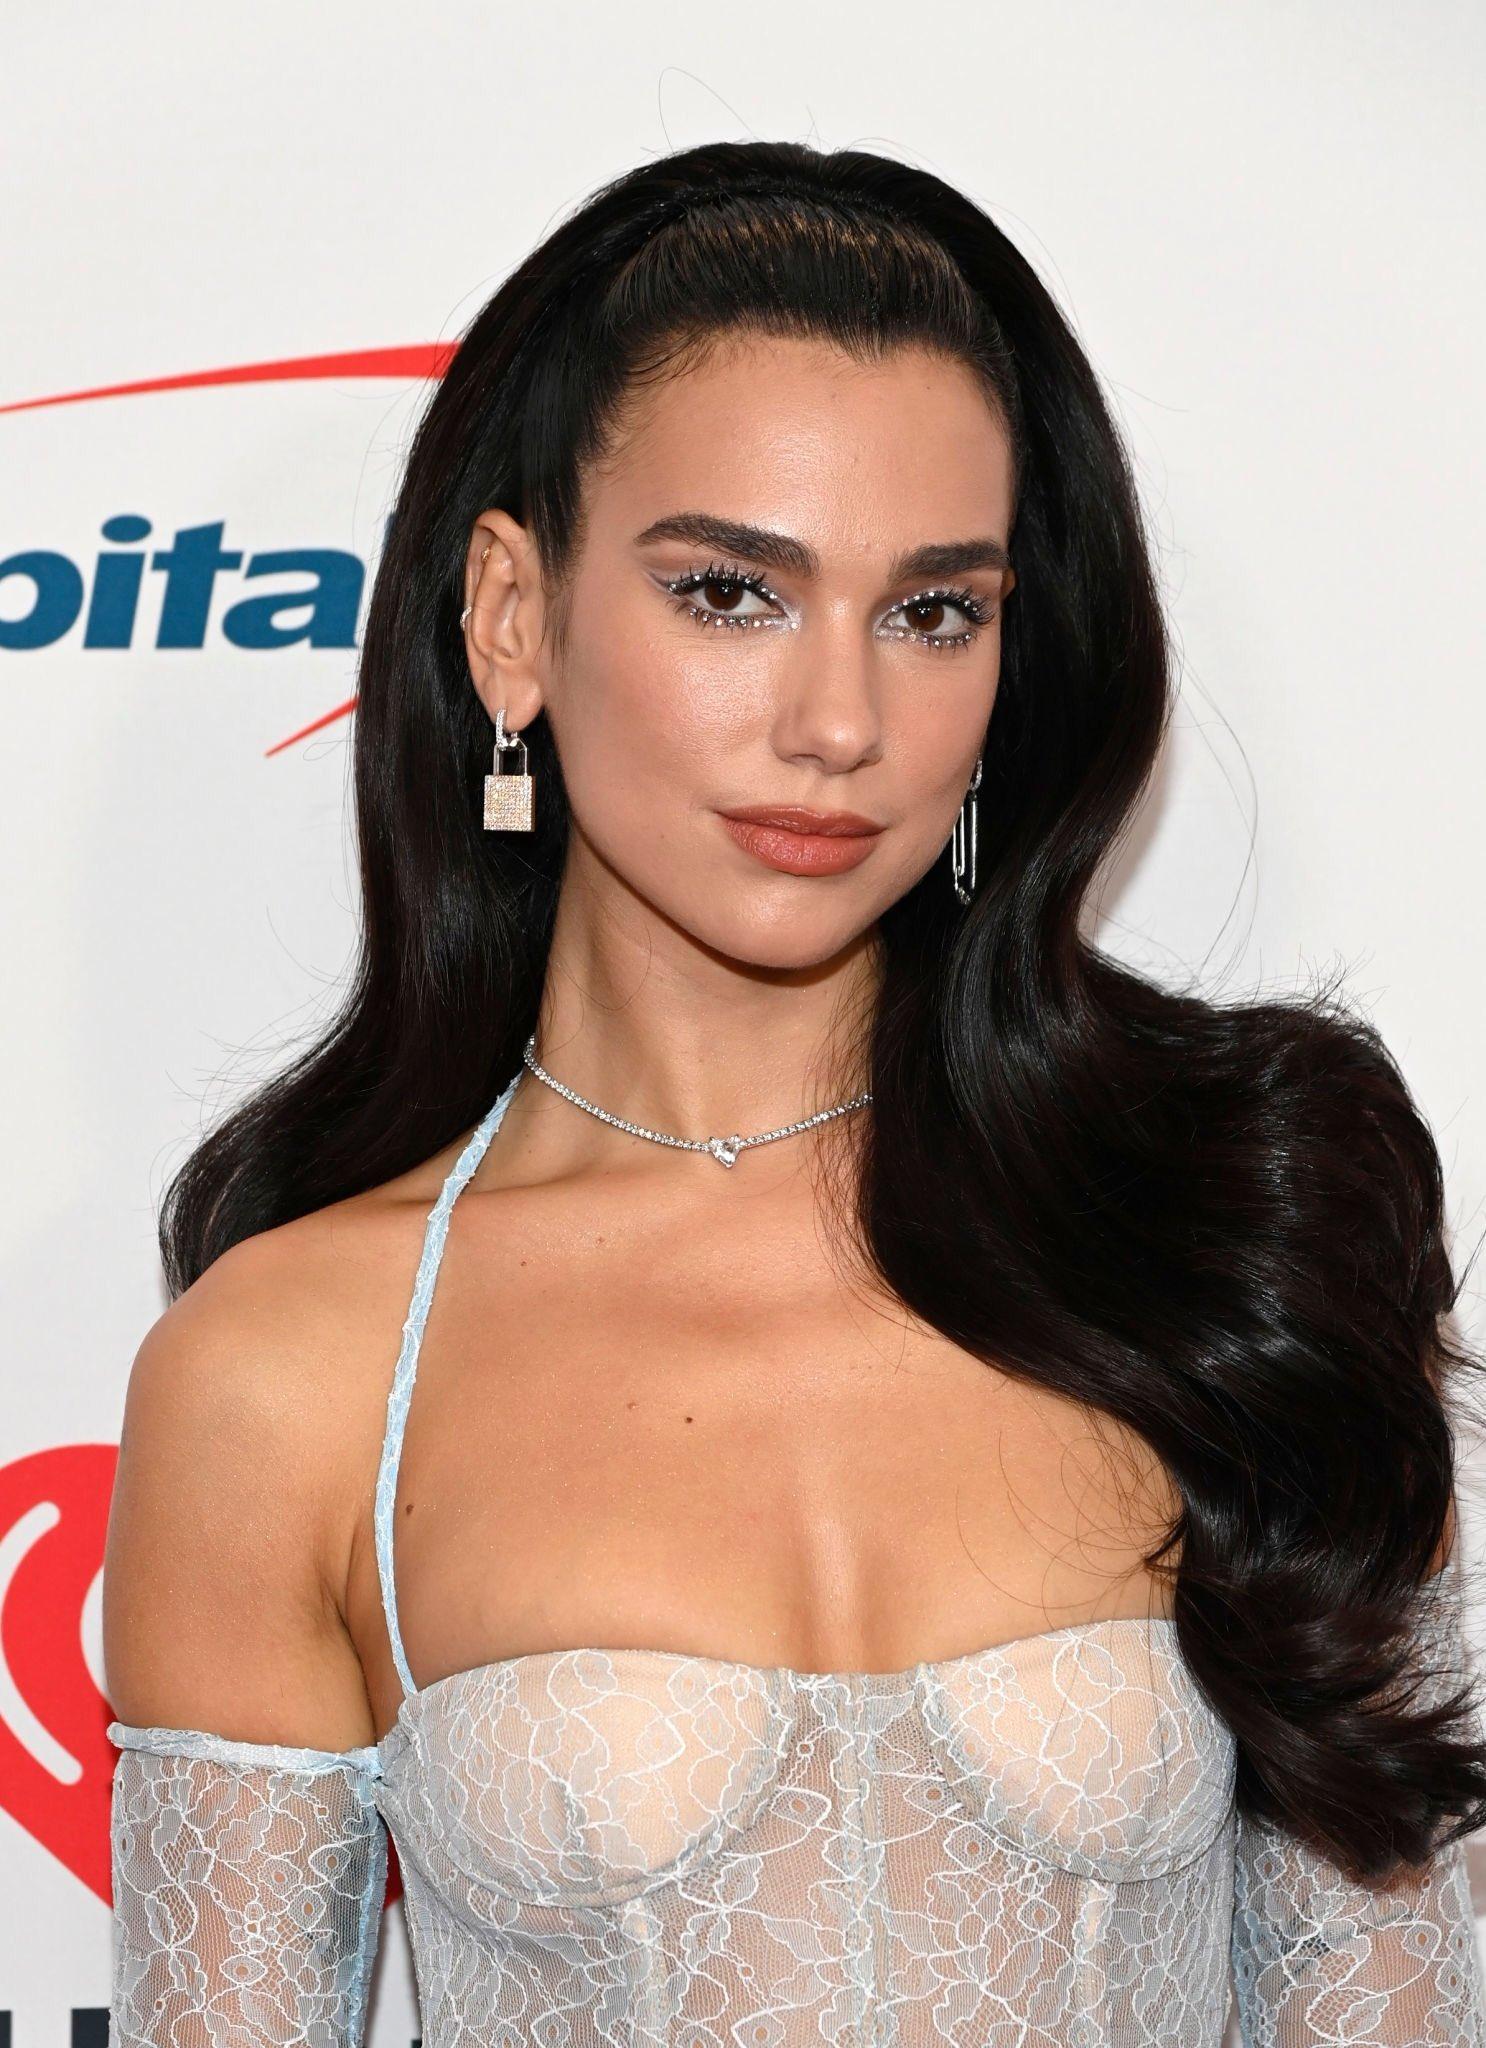 Dua Lipa dazzles in lace catsuit at the iHeartRadio Music Festival 2021